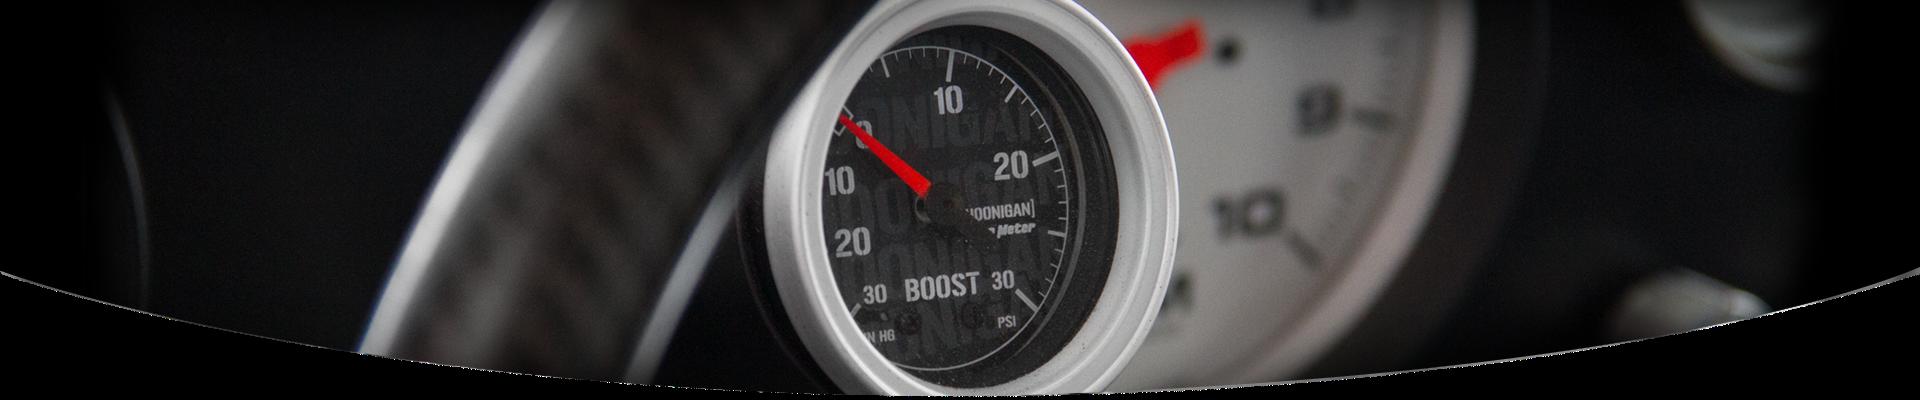 Turbo Boost Gauges